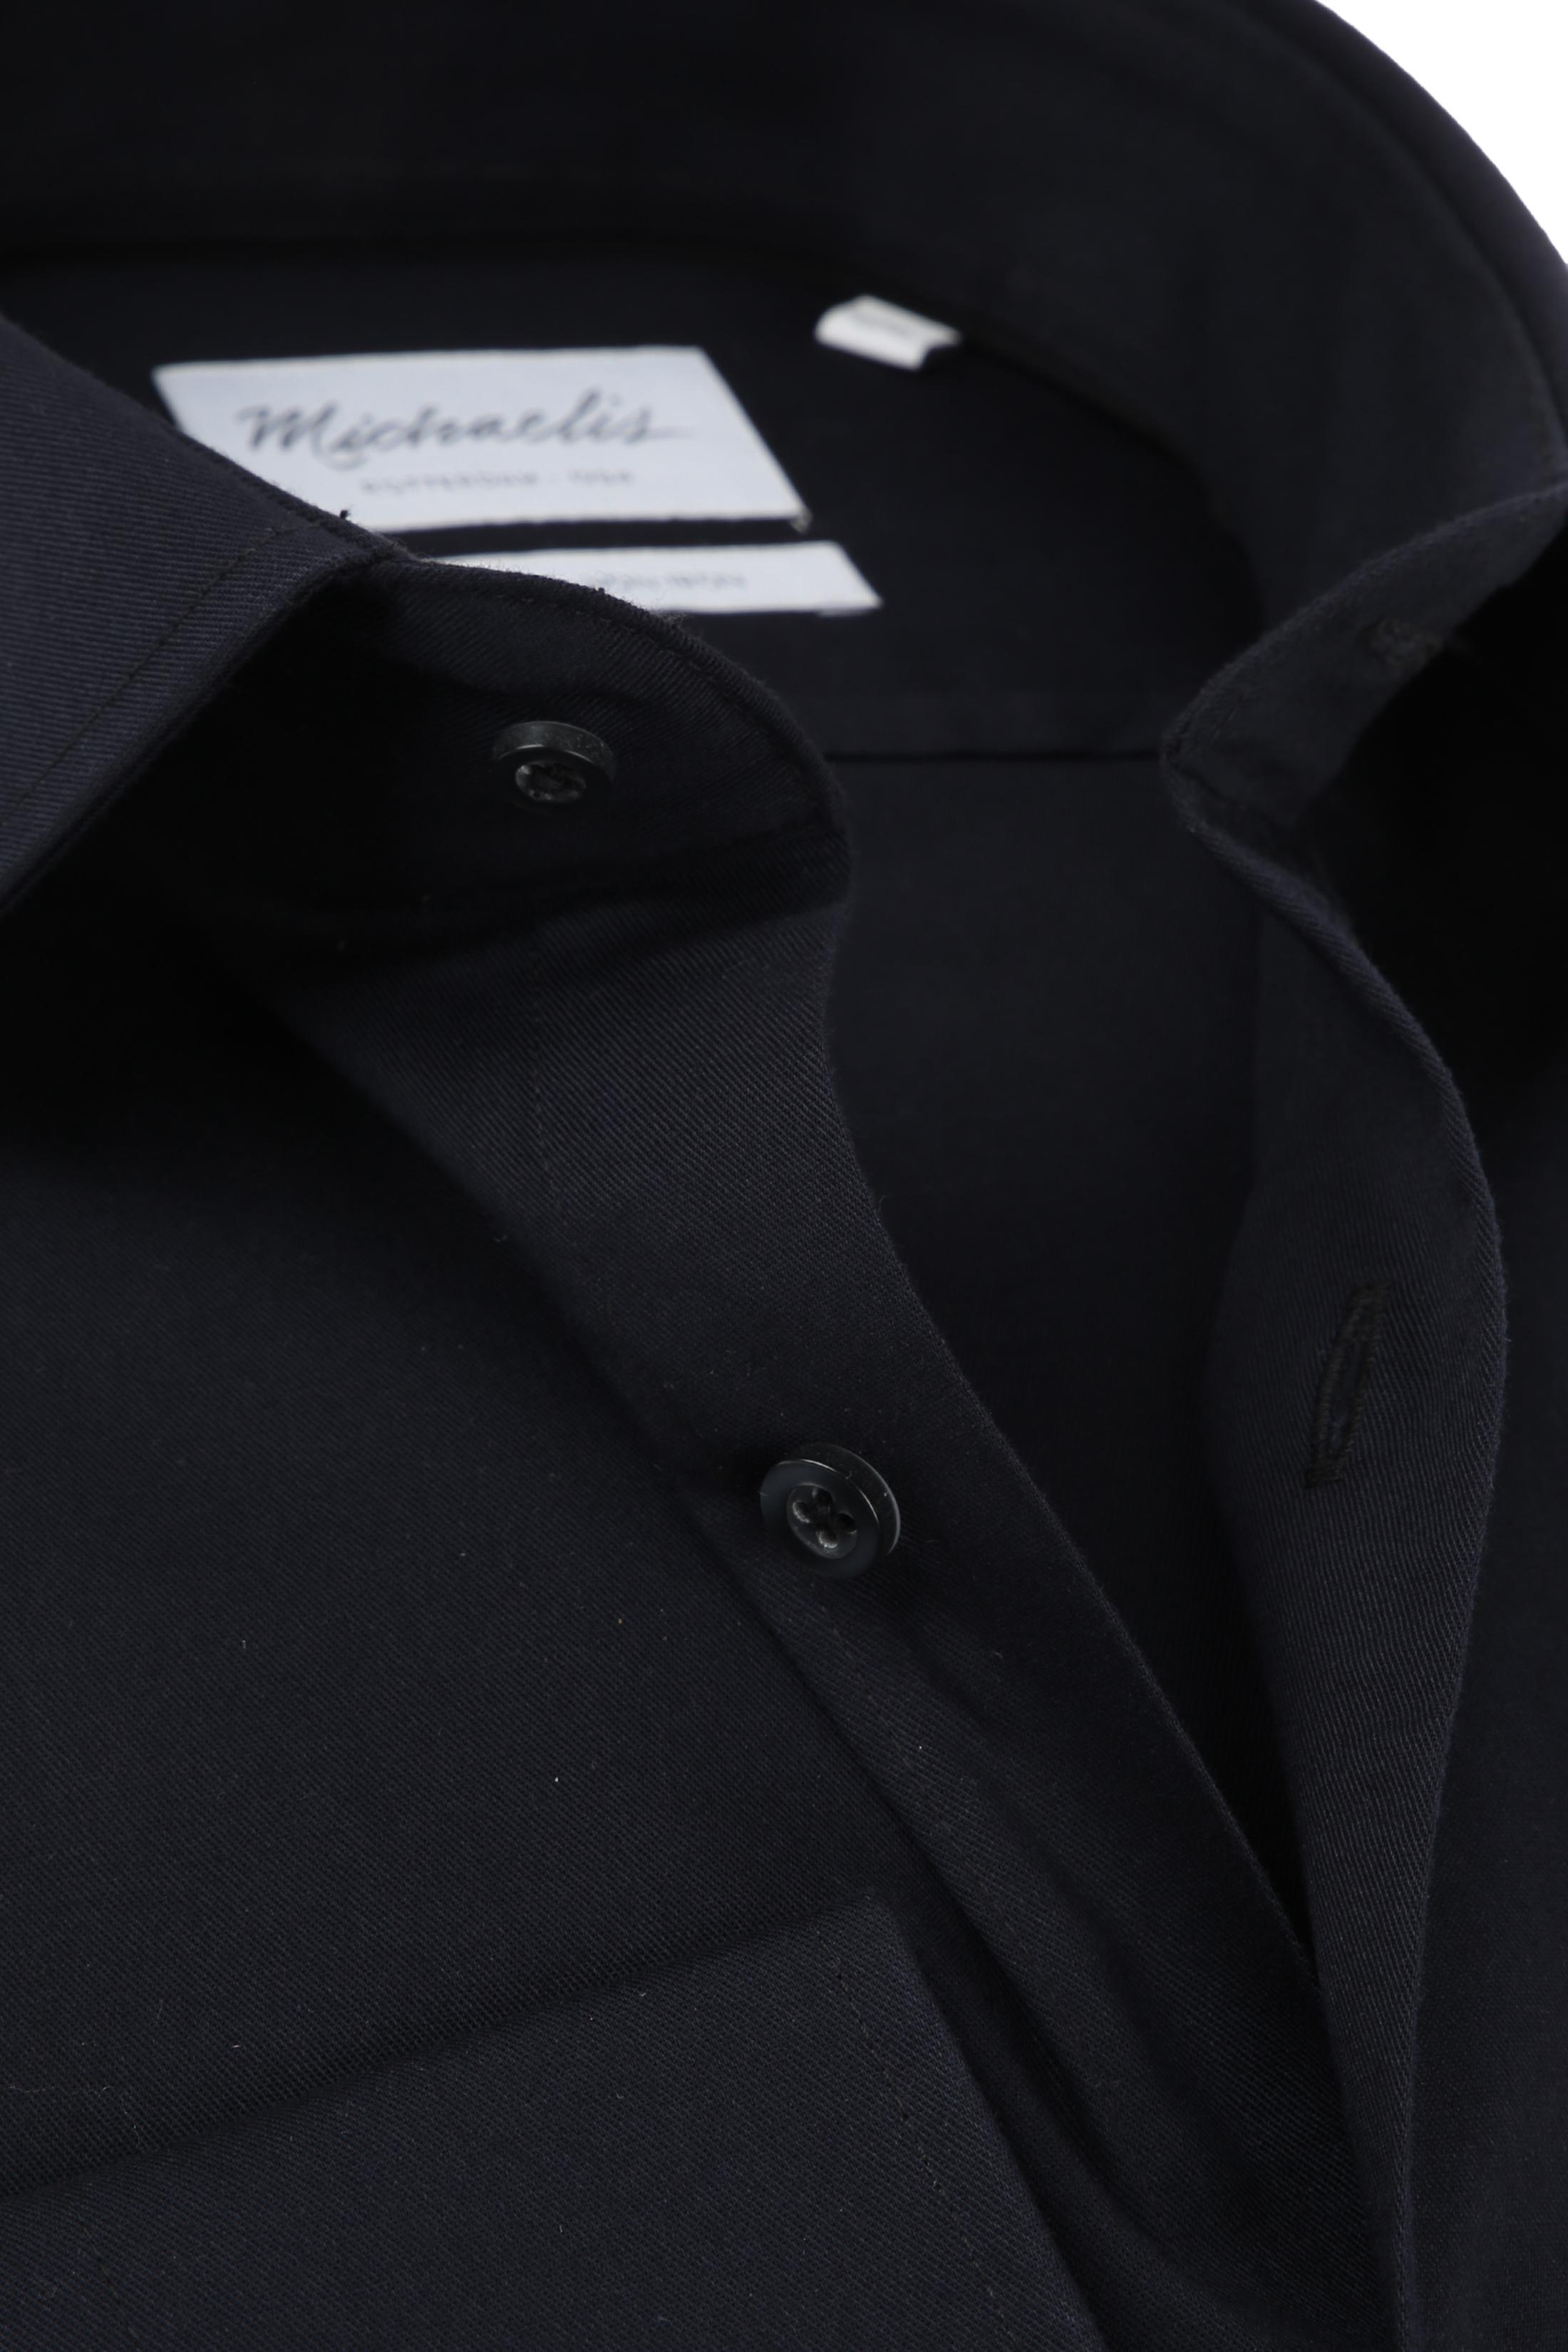 Michaelis Overhemd Slim Fit Zwart foto 2